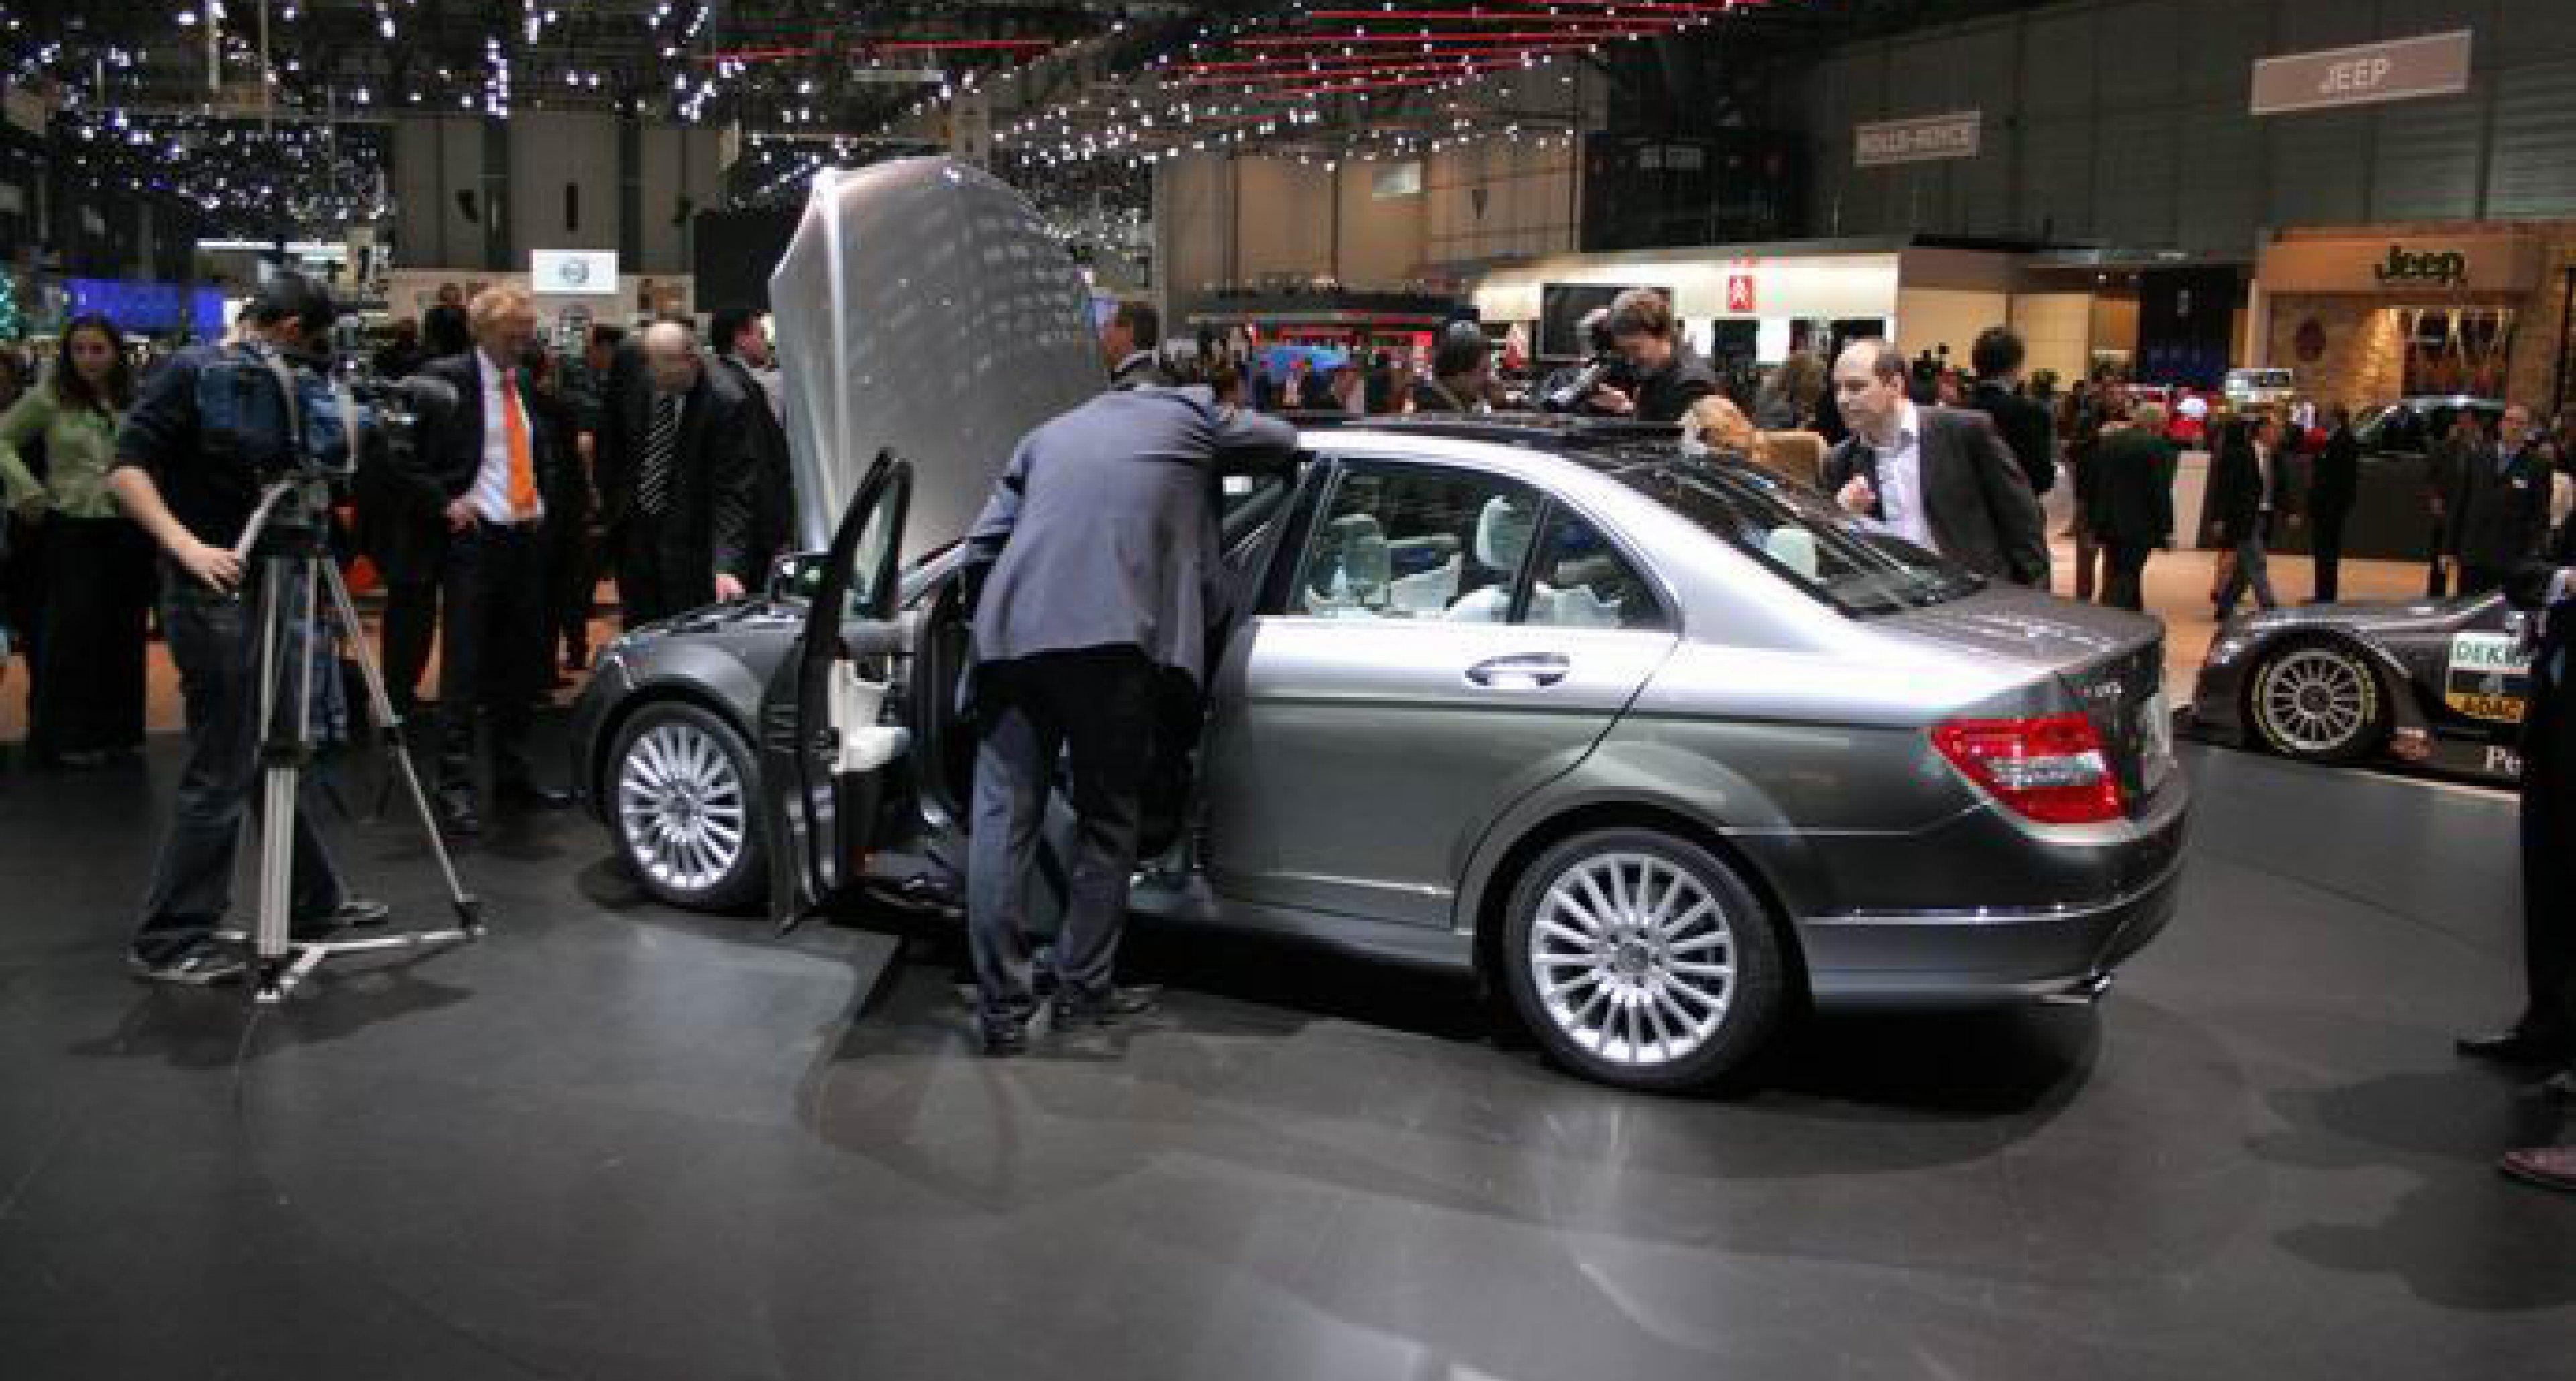 Genfer Automobilsalon 2007: Genfer Enthüllungen